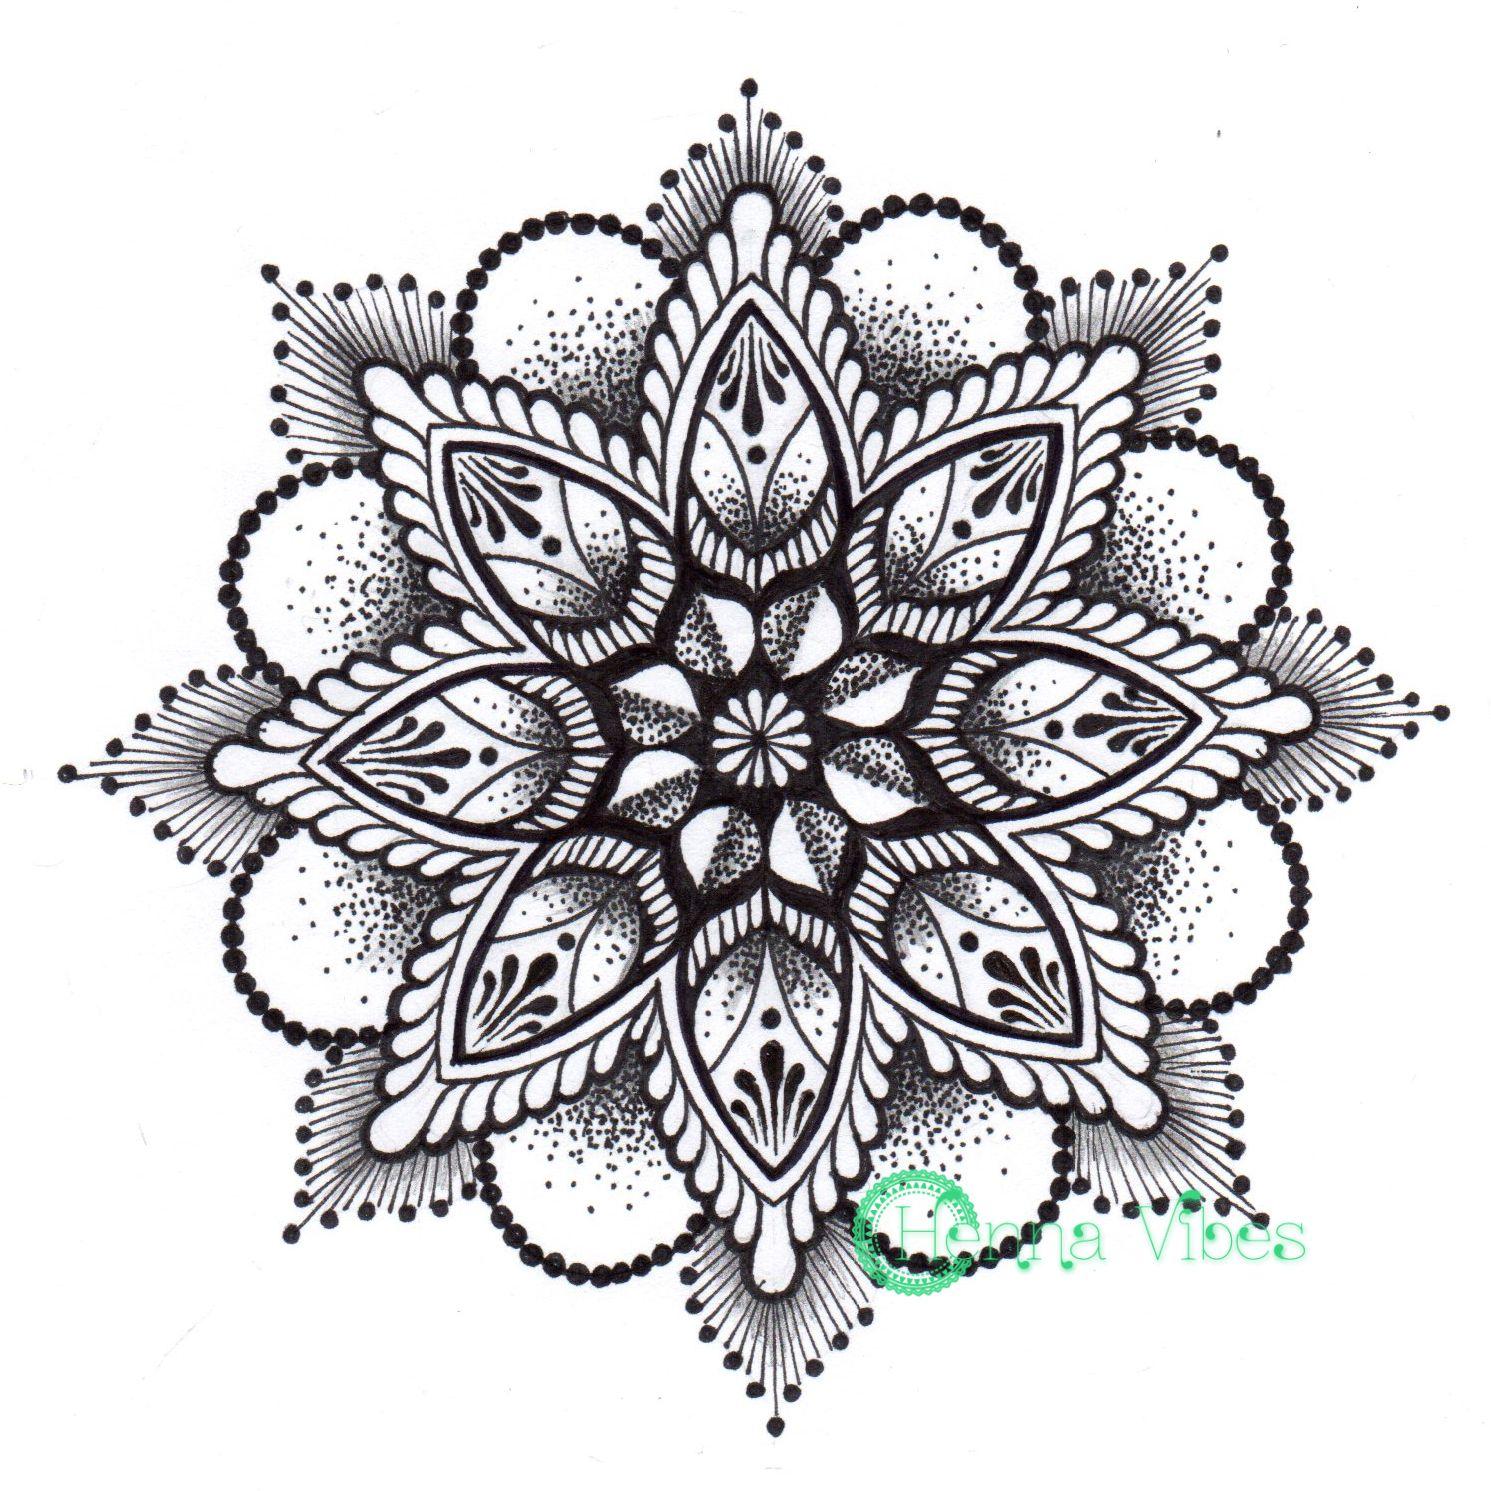 Mandala Tattoo Design On Pinterest: Dotwork Mandala By Mish At Henna Vibes